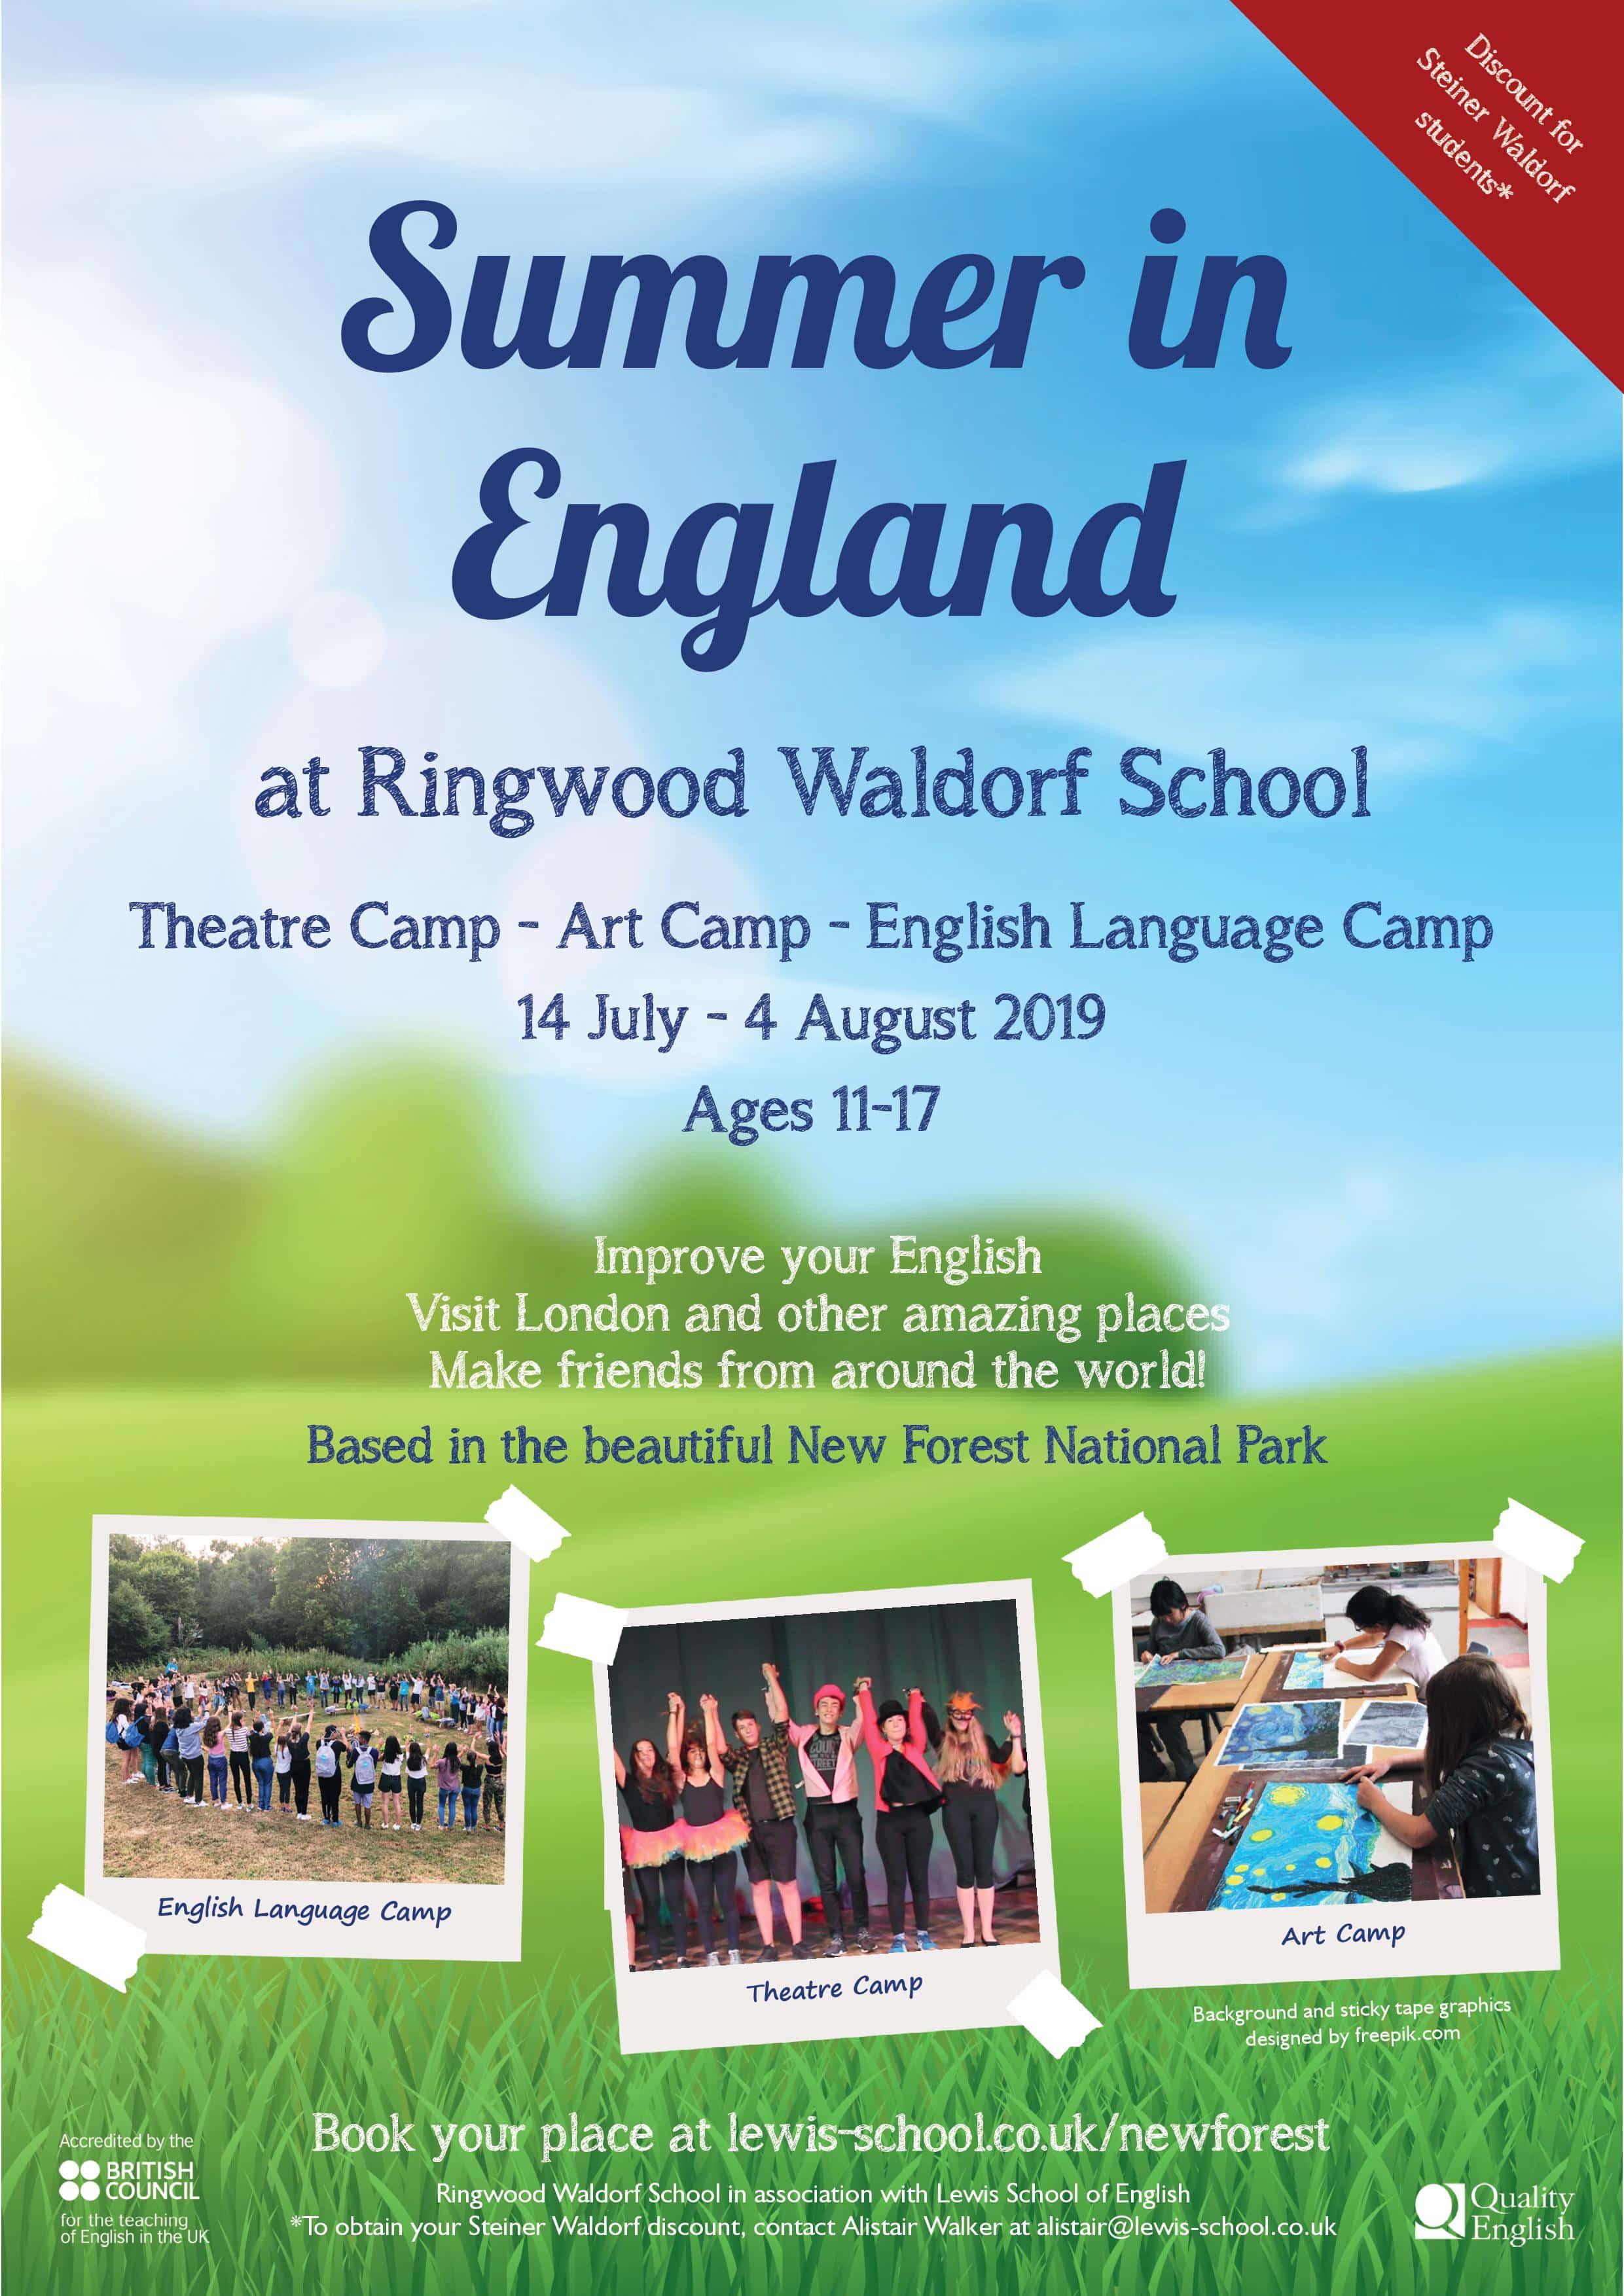 Summer school Theatre Art & English at Ringwood Waldorf School